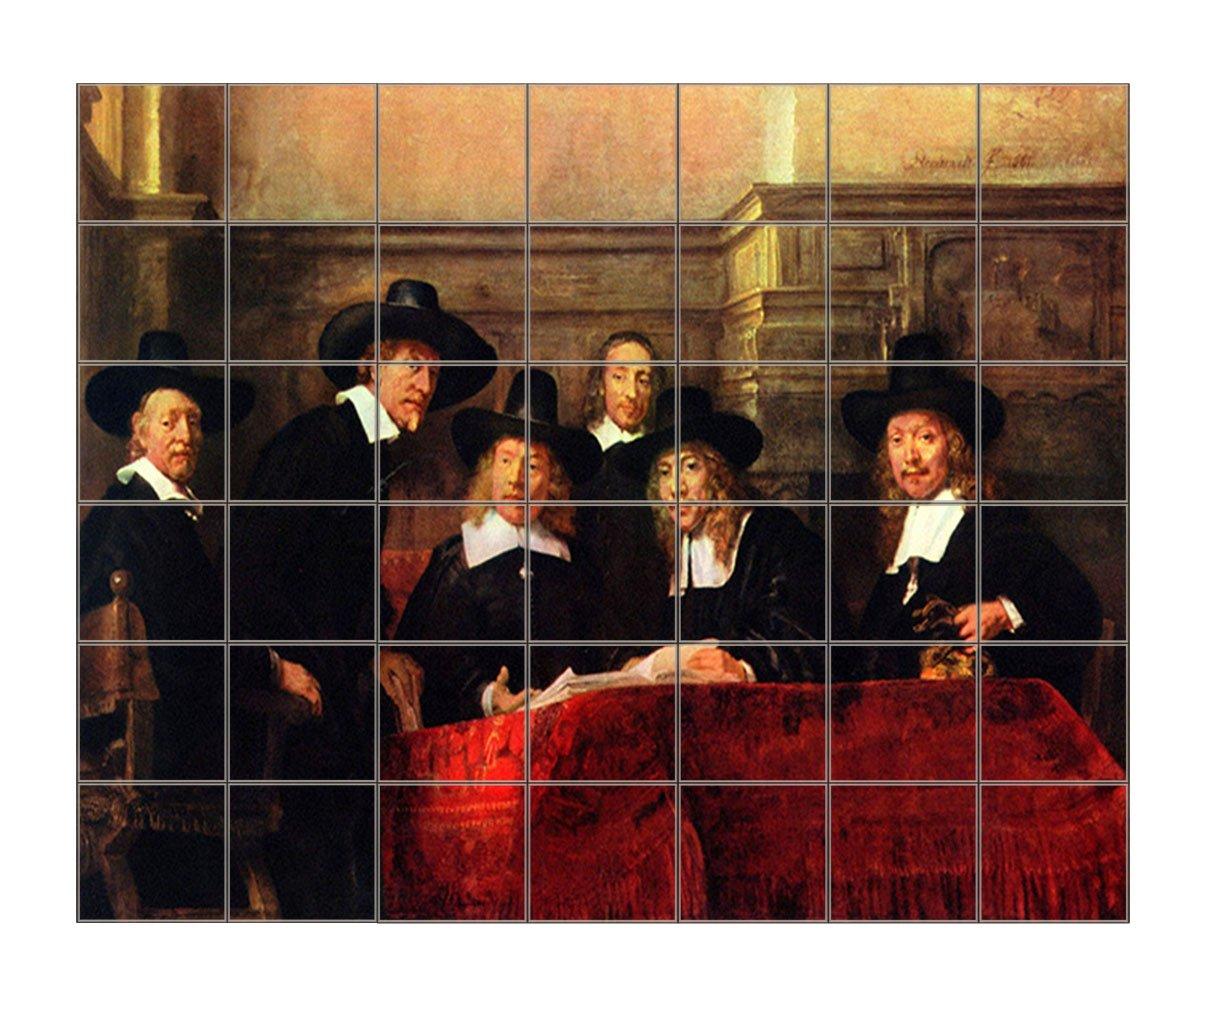 Chairman Cloth Makers Guild (Rembrandt) Horizontal Tile Mural Satin Finish 36''Hx42''W 6 Inch Tile